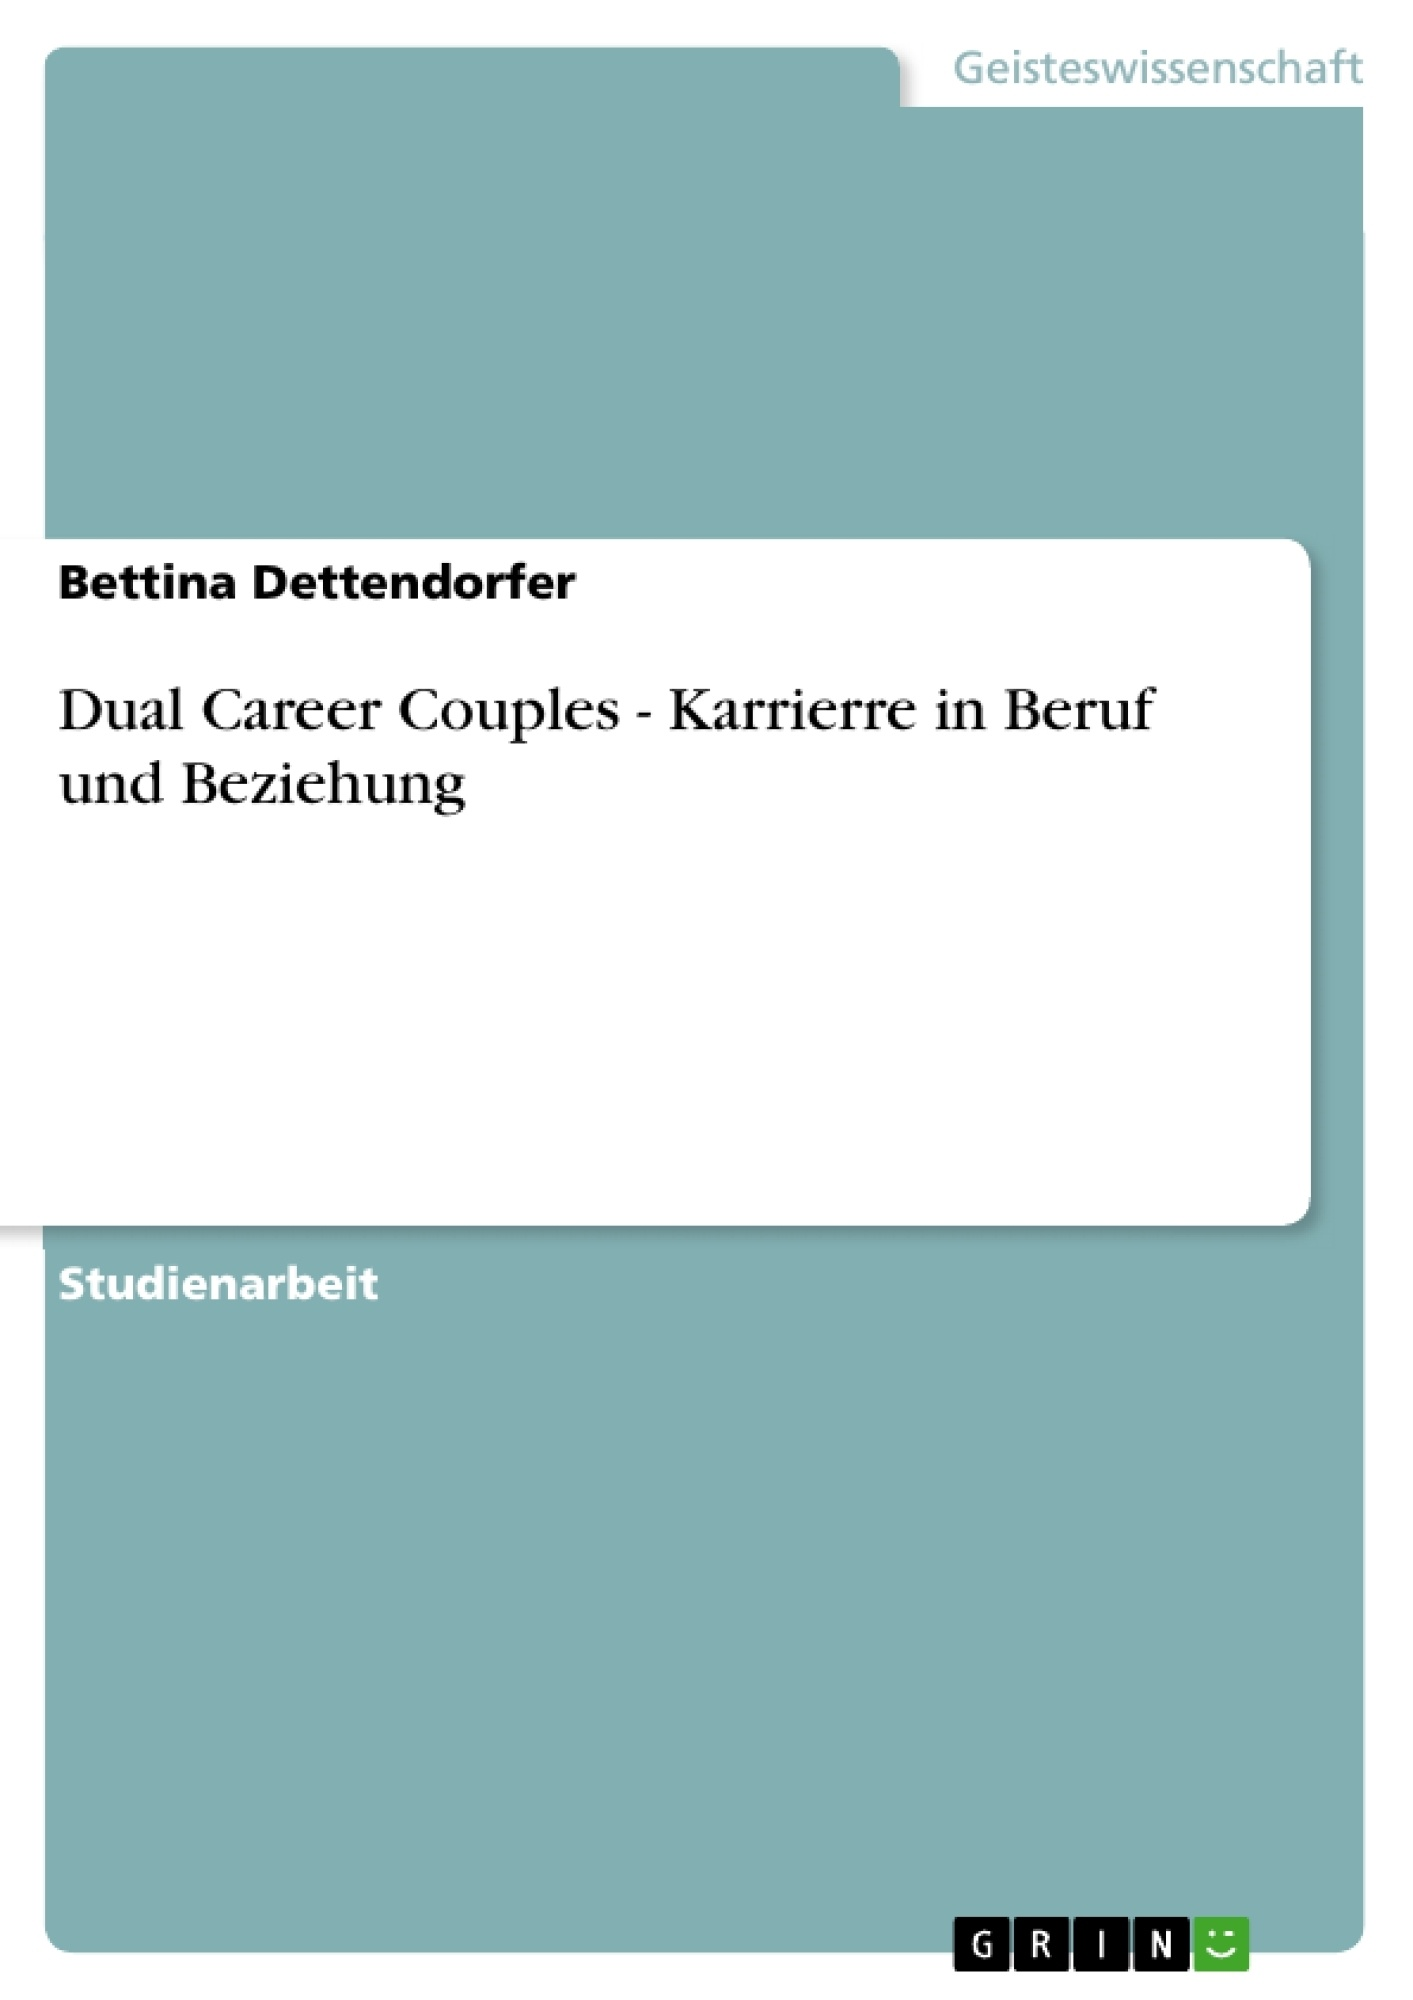 Titel: Dual Career Couples - Karrierre in Beruf und Beziehung